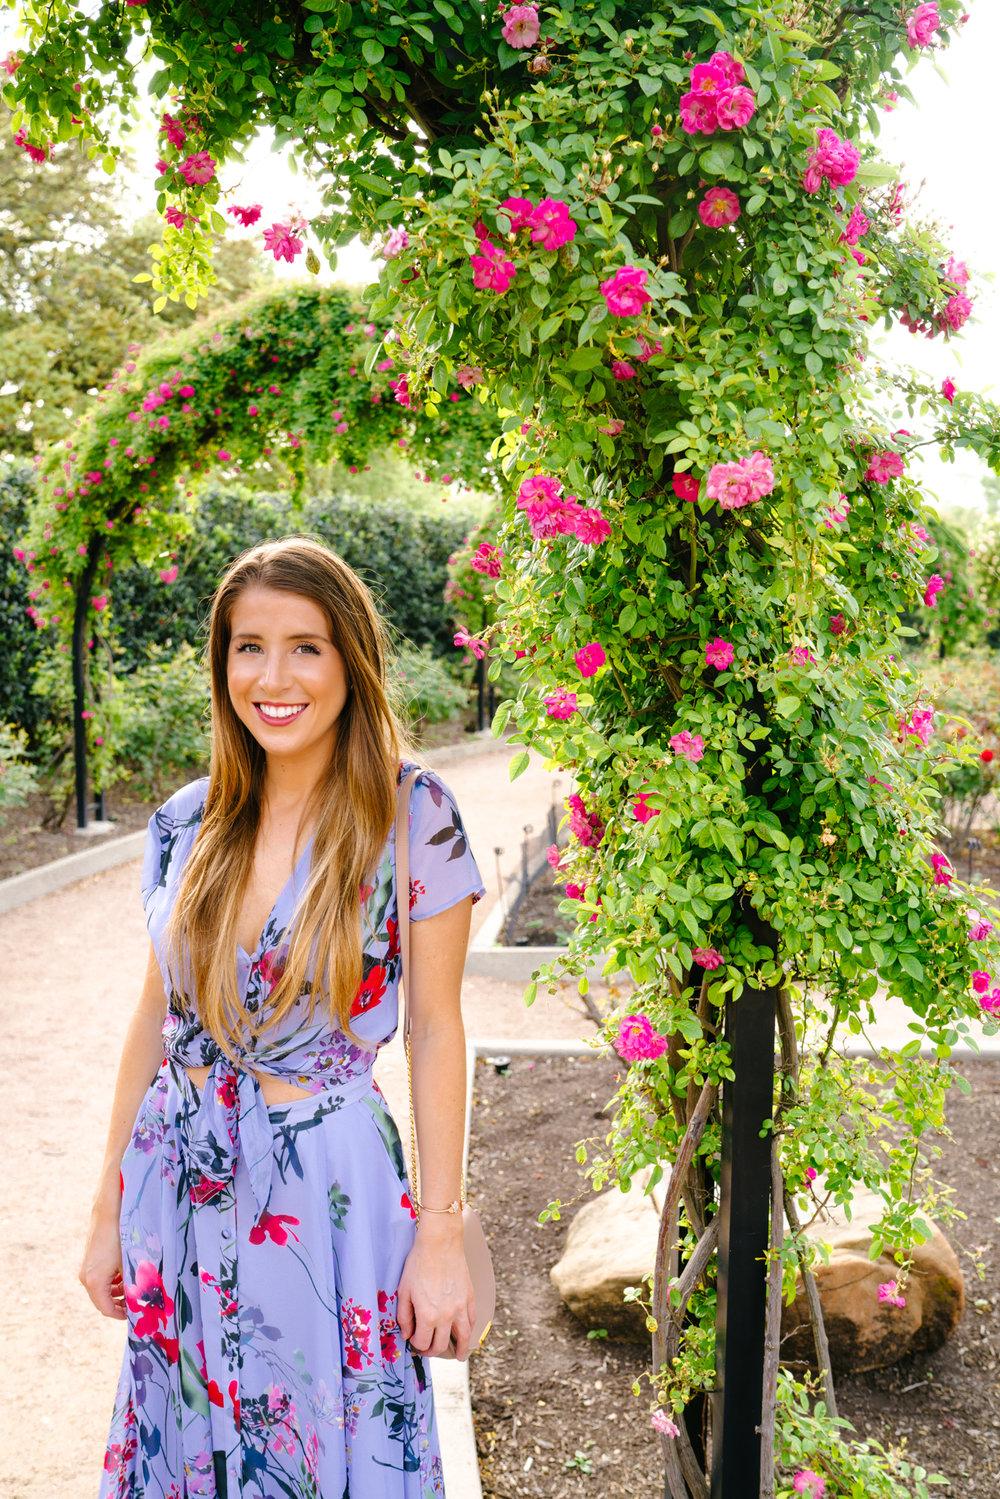 Wearing a floral Yumi Kim dress in the McGovern Centennial Rose Garden